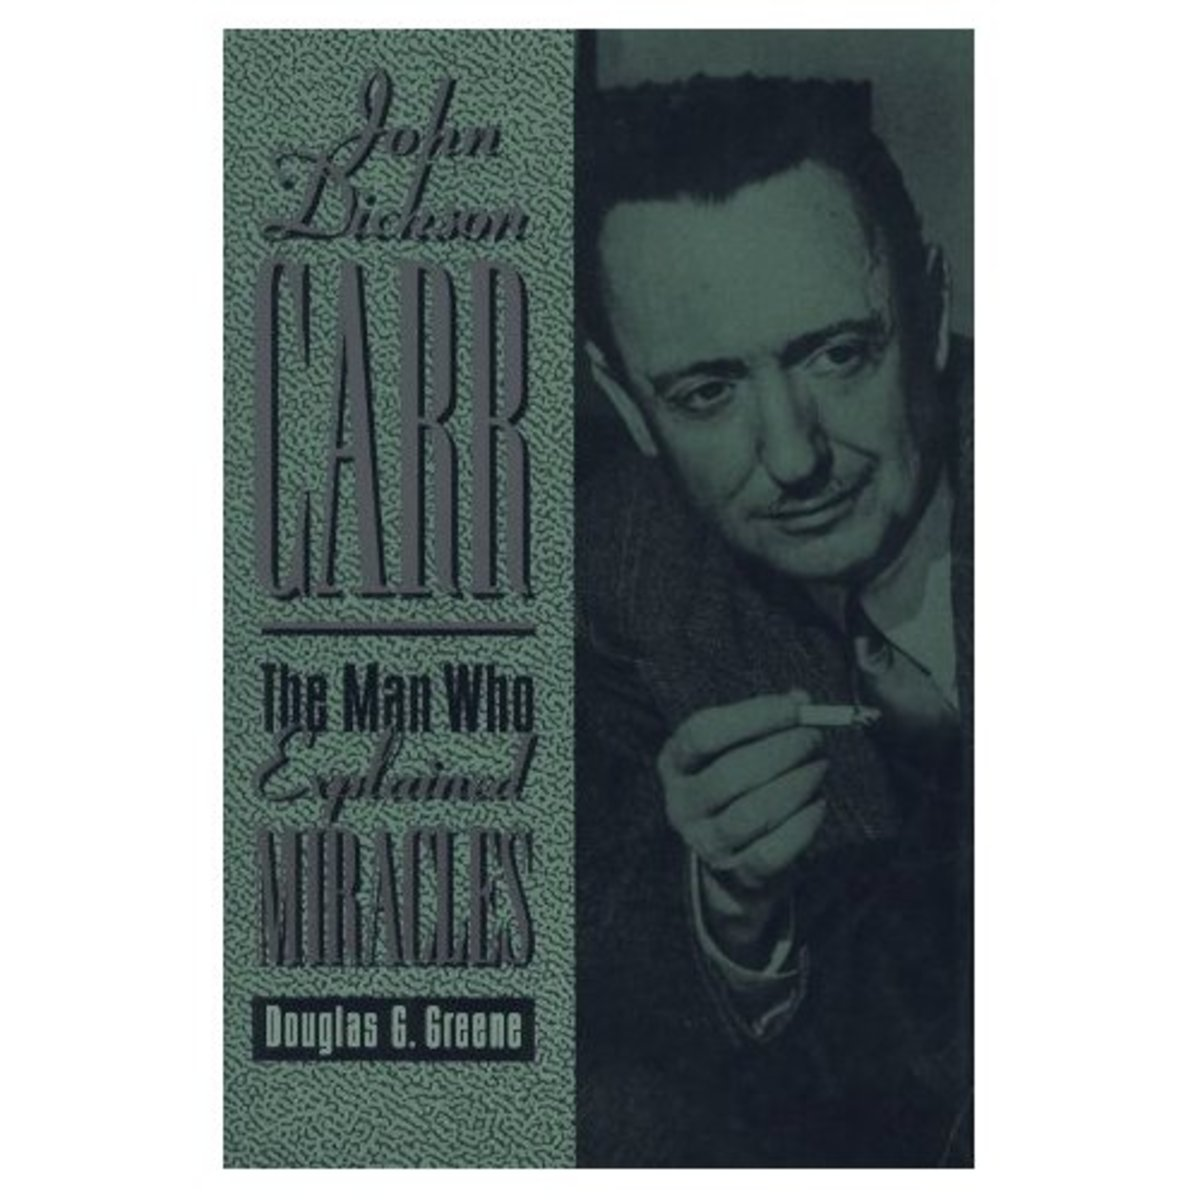 Douglas Greene's Biography of Carr